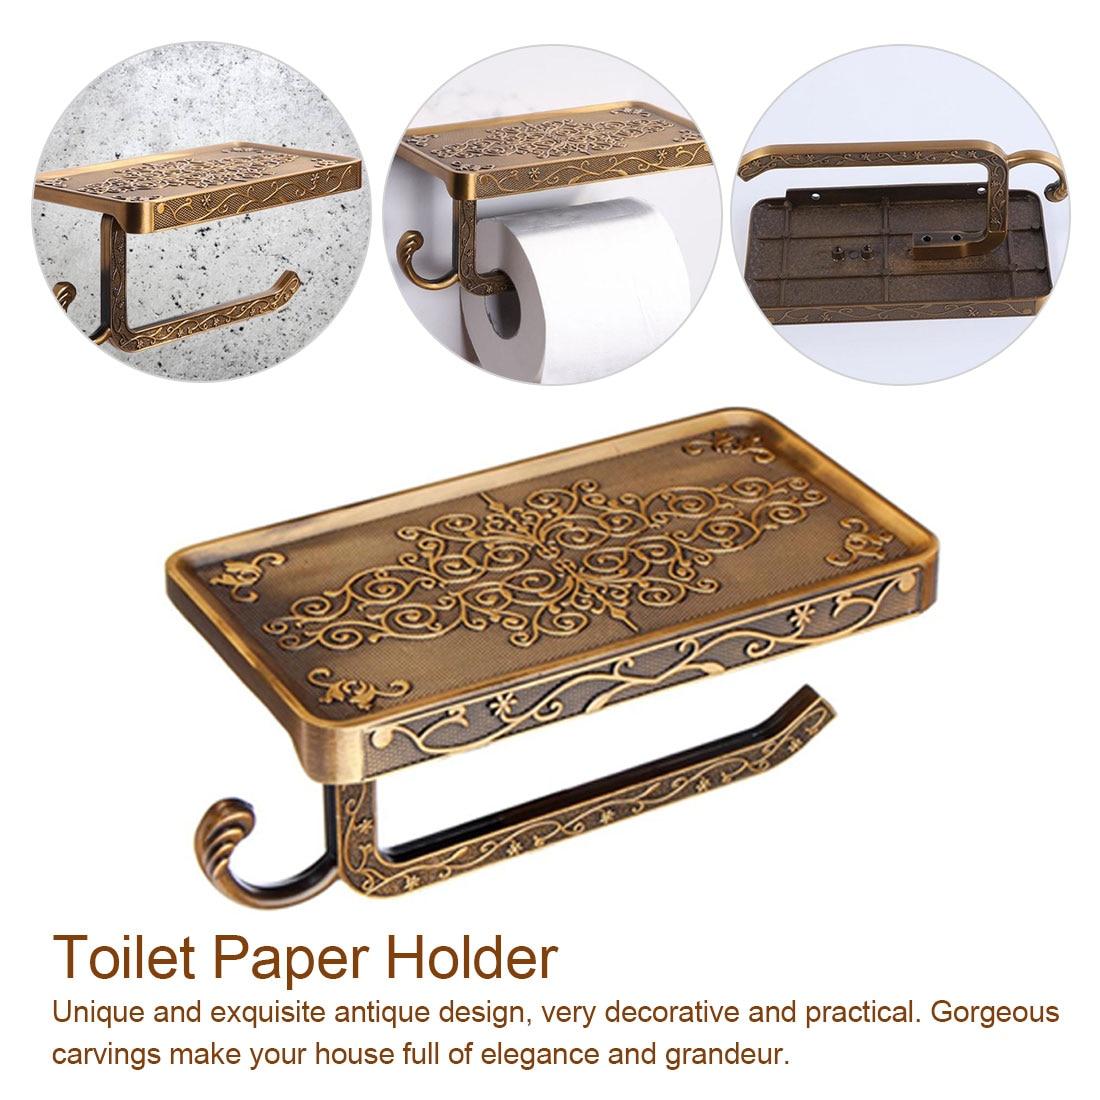 Antique Brass Toilet Paper Holder Bathroom Mobile Holder Toilet Tissue Paper Roll Holder Bathroom Storage Rack Accessory